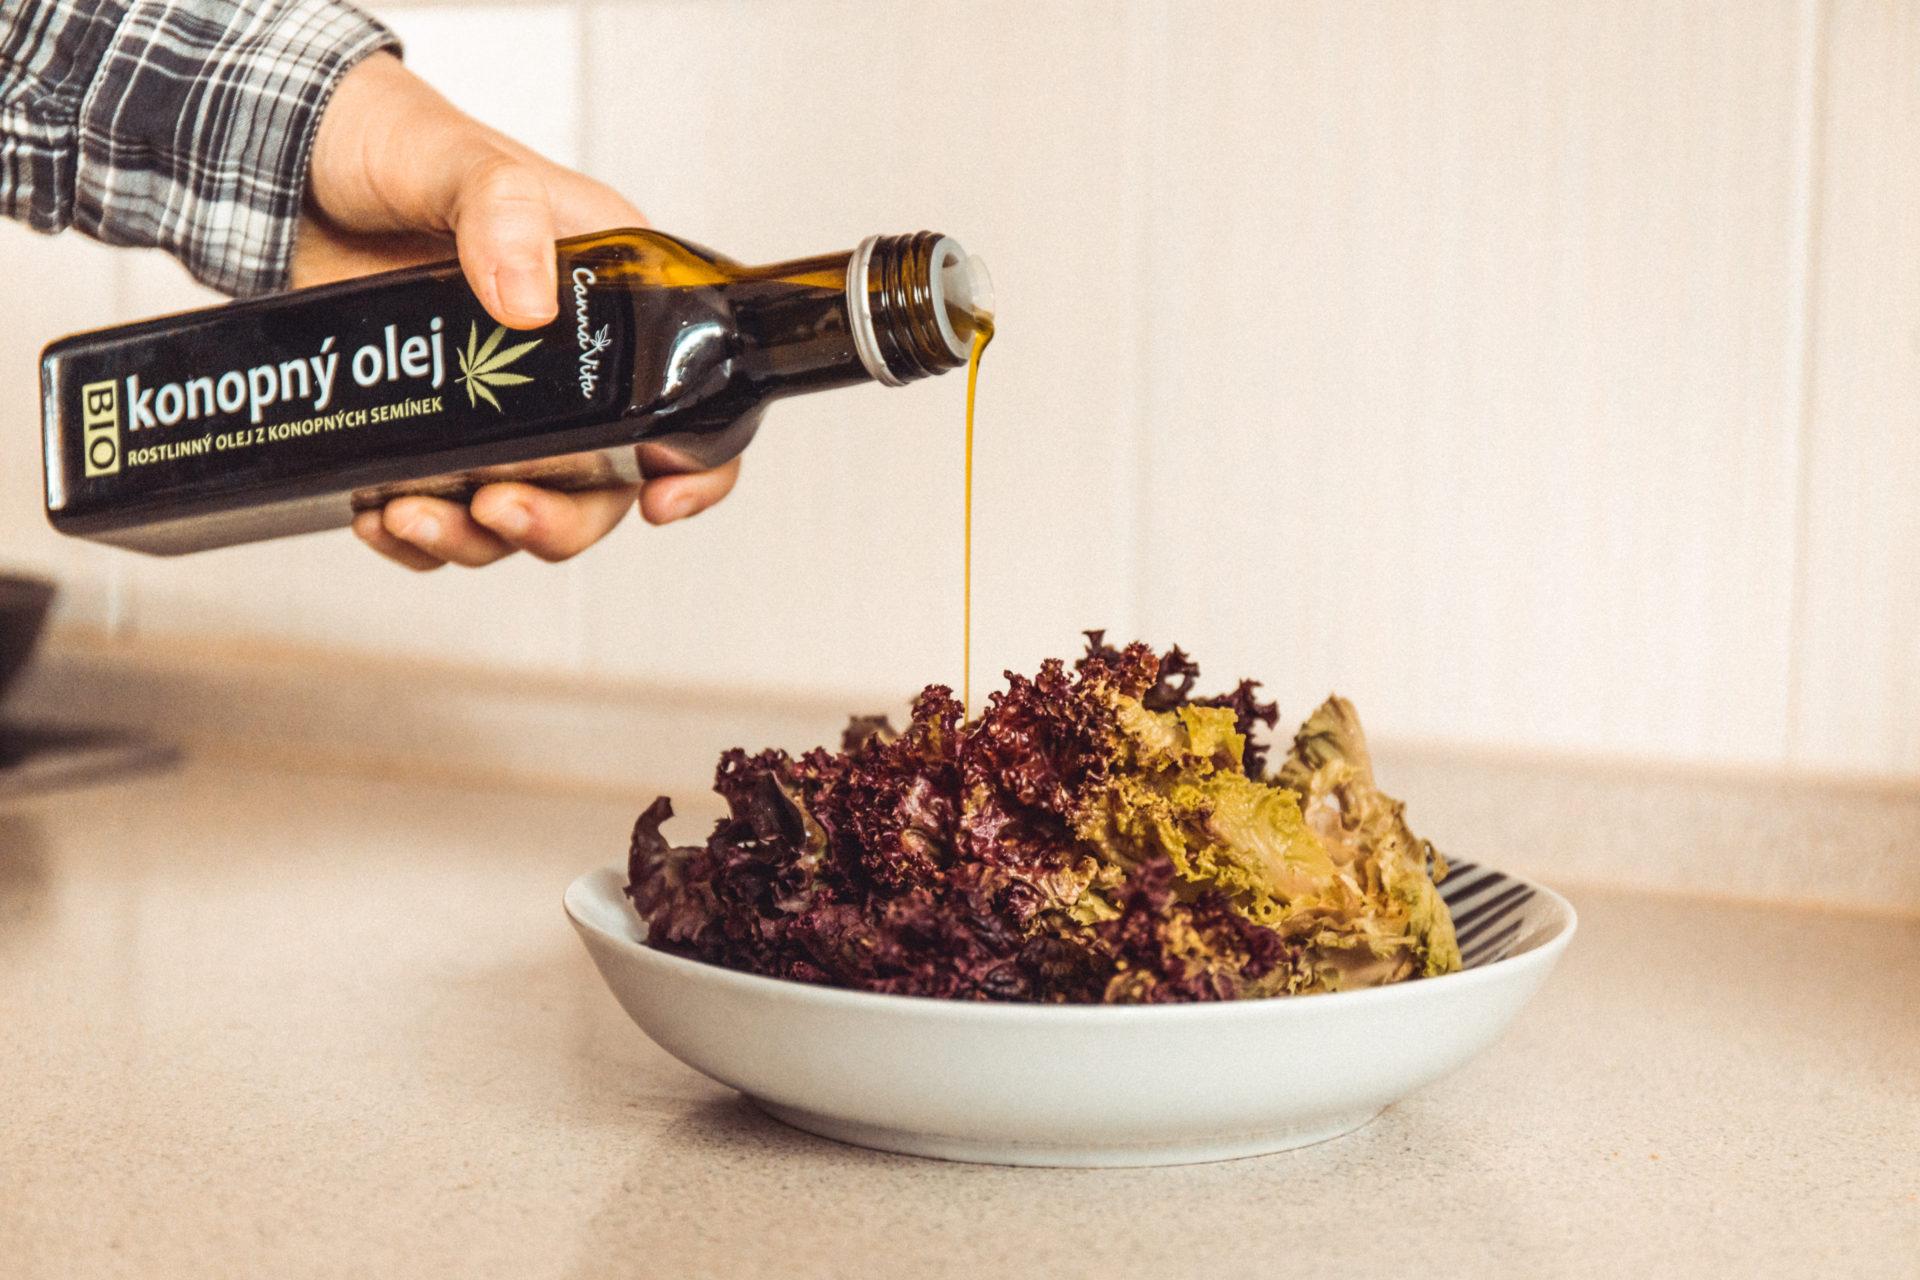 Salát s konopným olejem